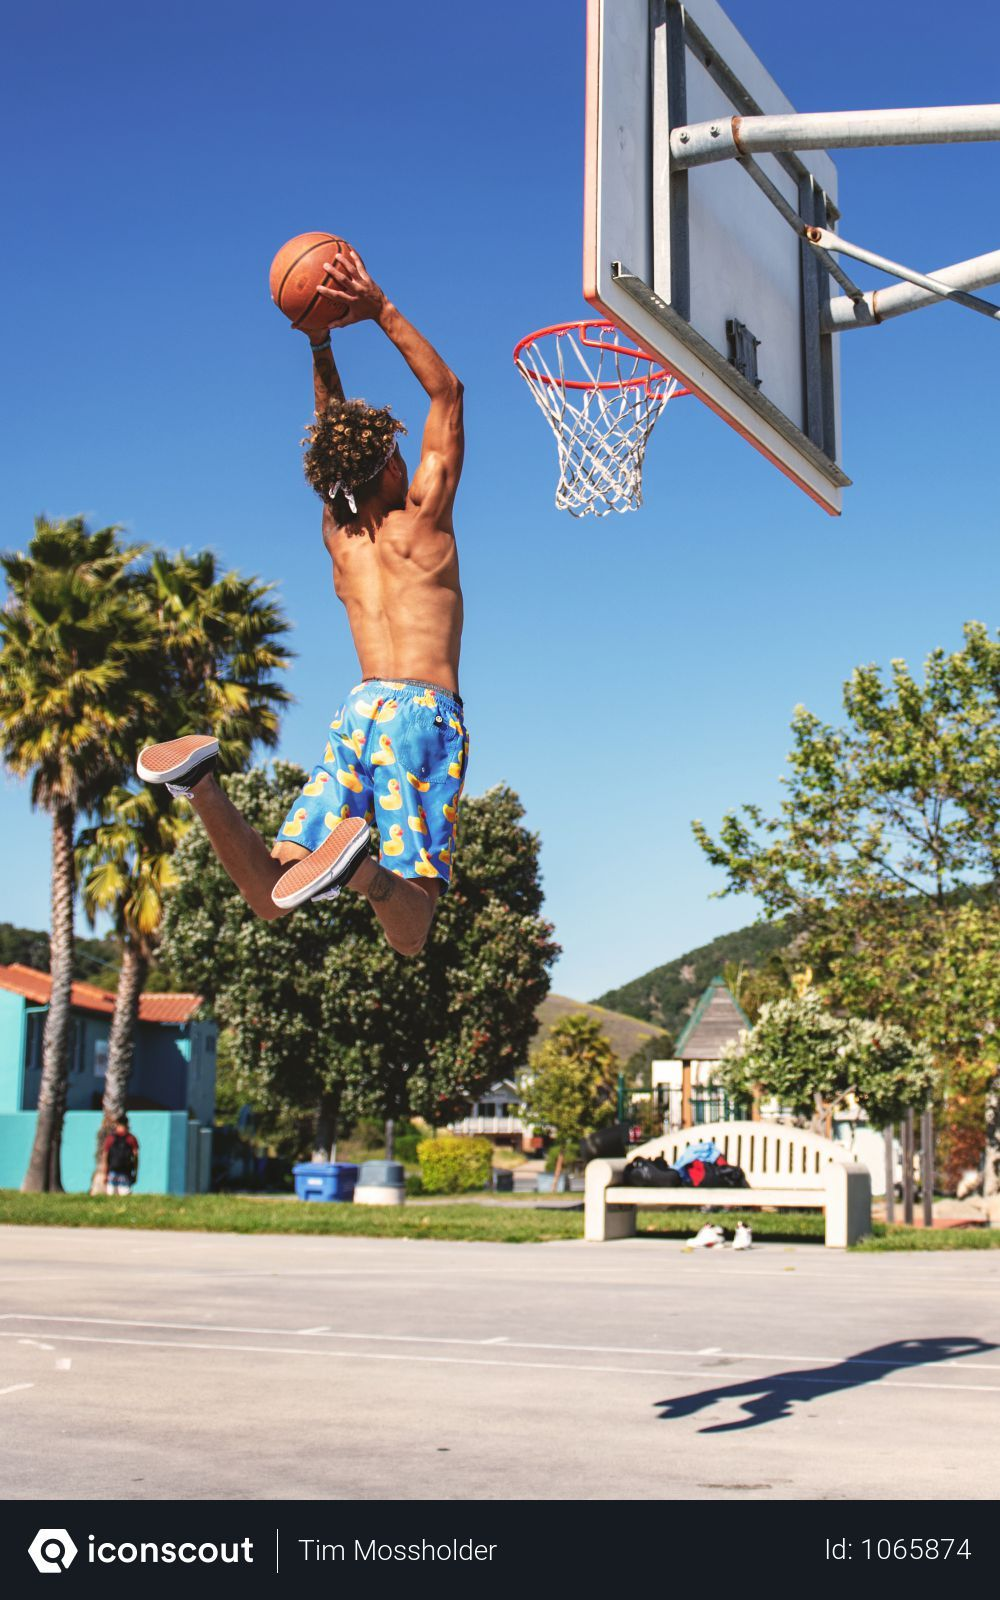 Free Man Wearing Blue And Yellow Shorts Playing Basketball